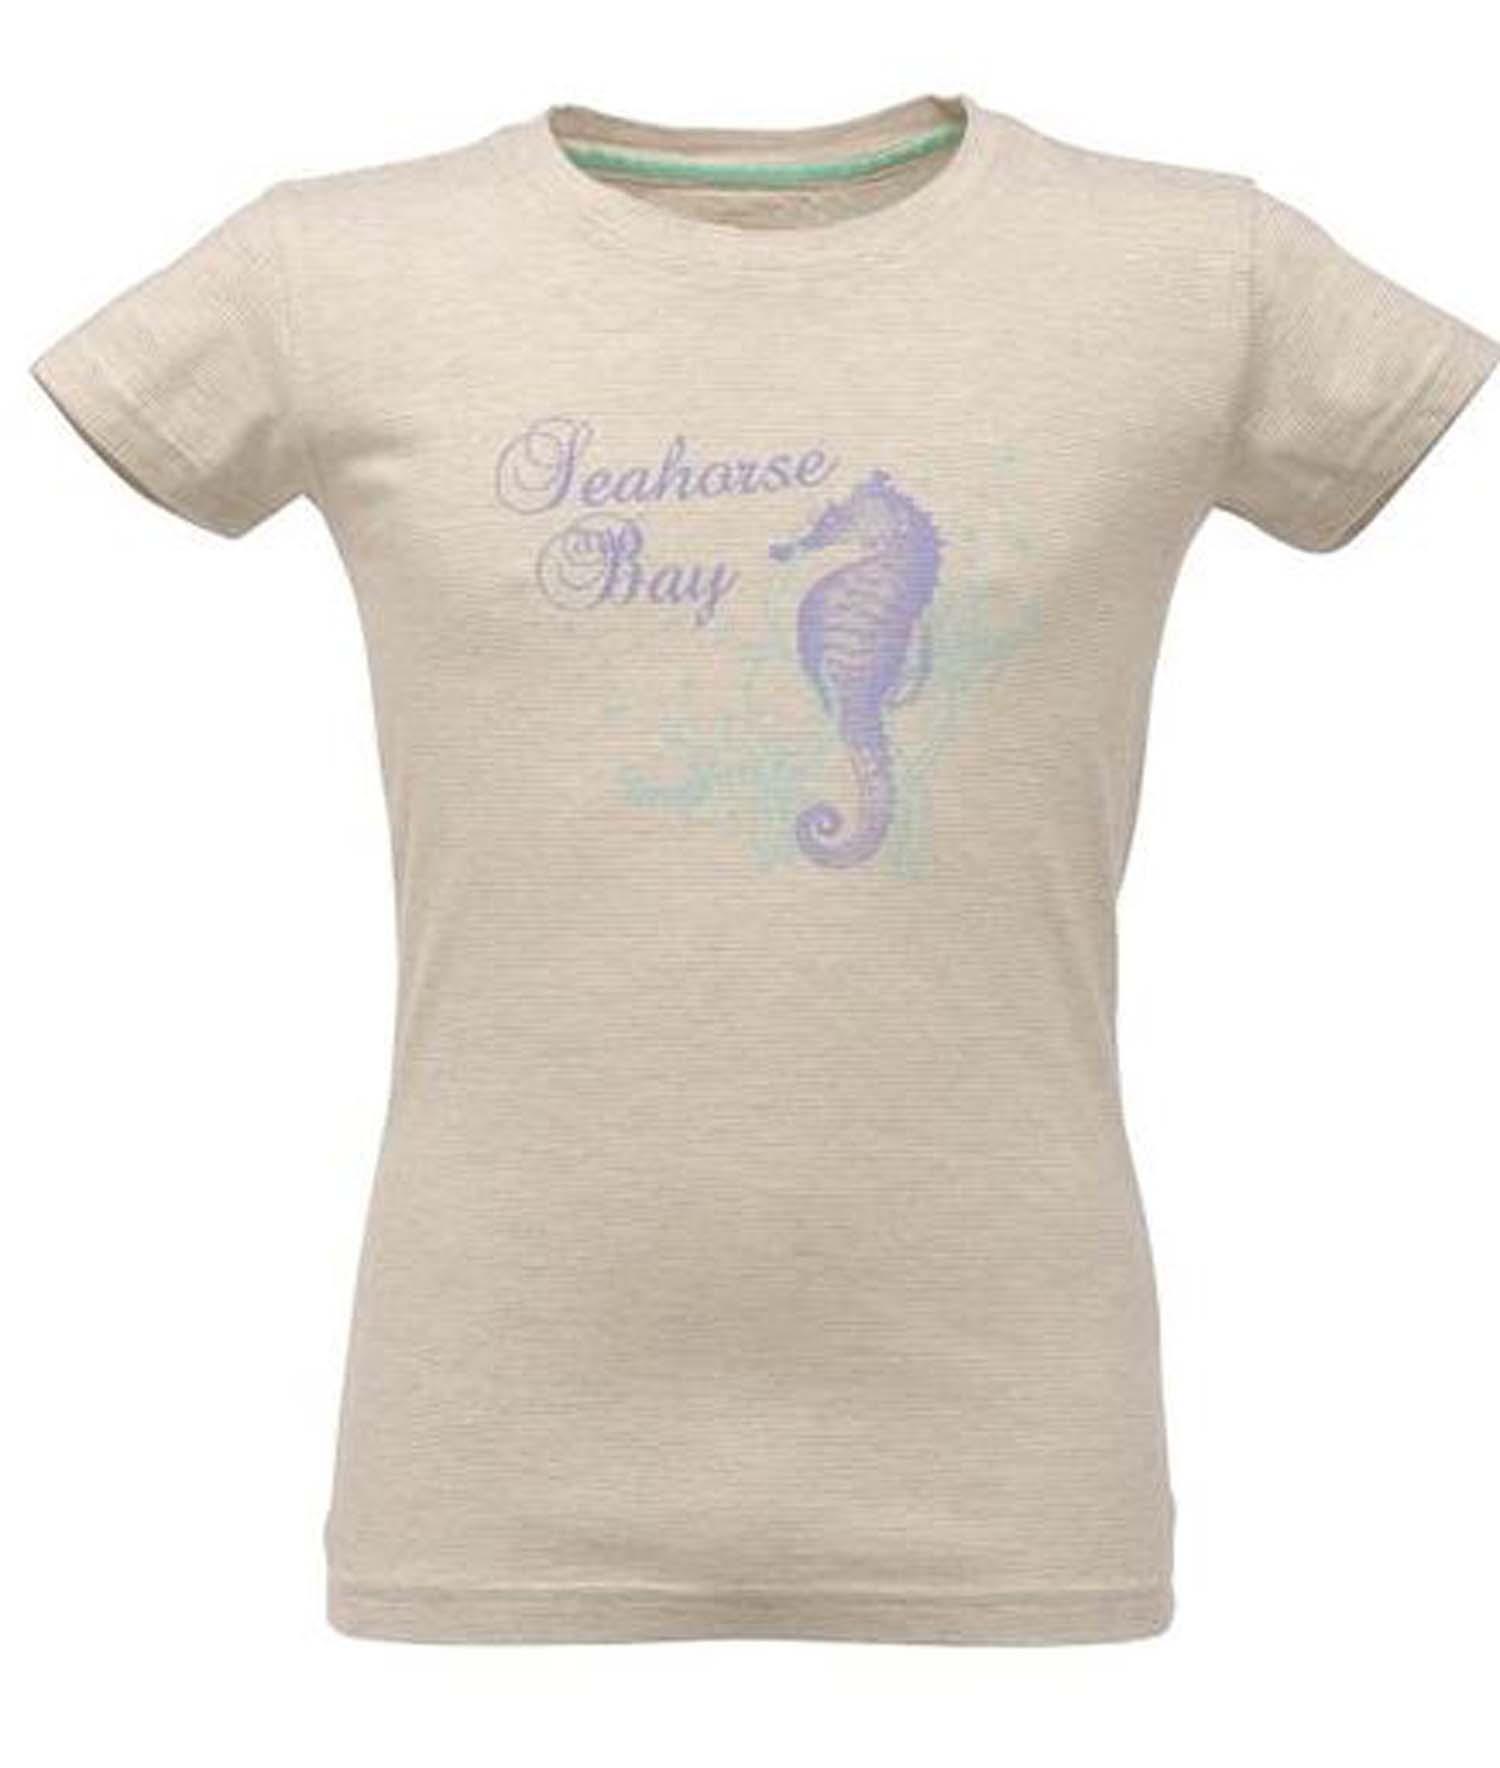 Design t shirt kid - Regatta Sunradar Boys Girls Kids Coolweave Cotton Design